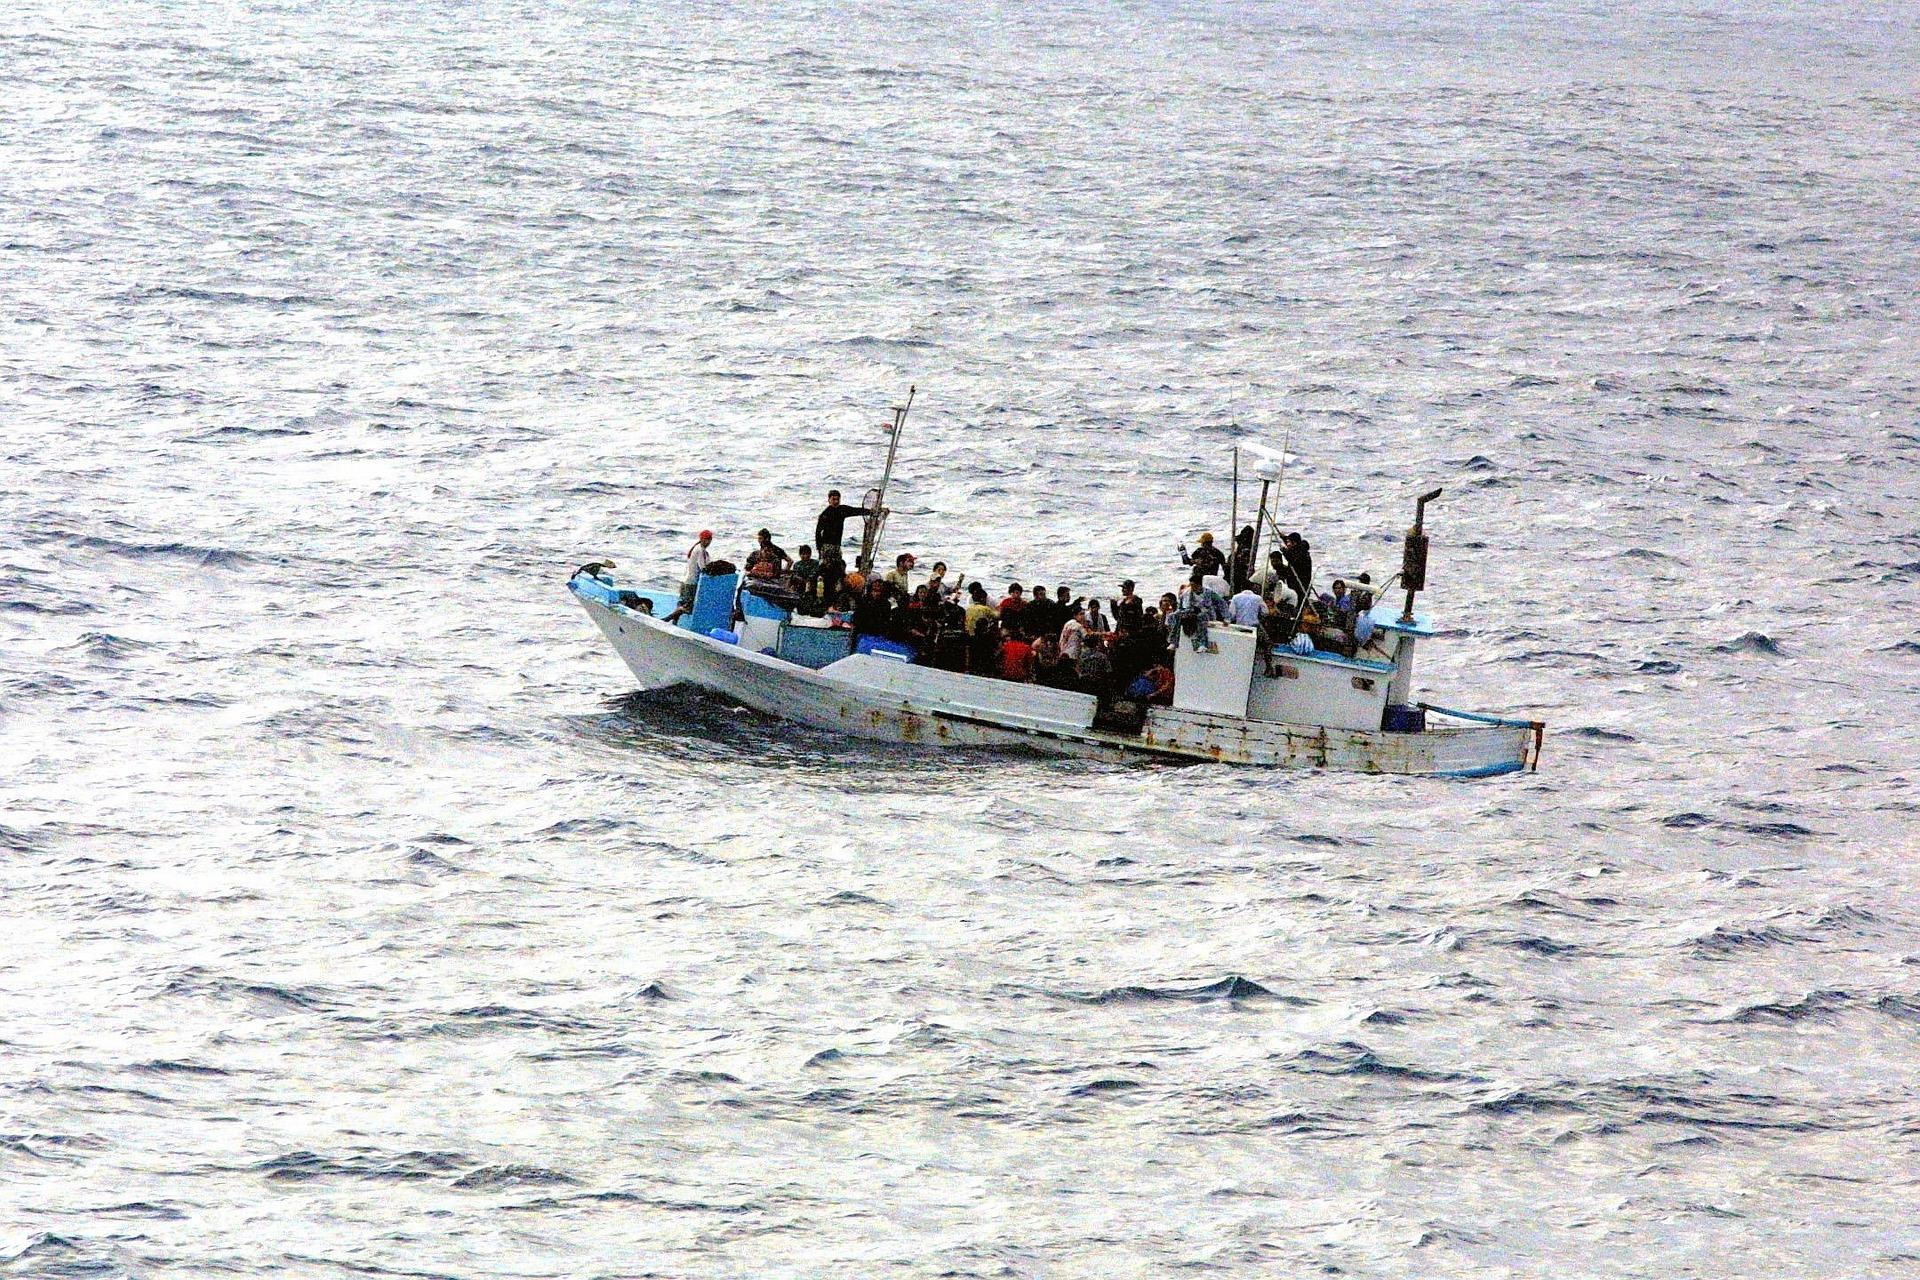 Video: Türkische Küstenwache rammt Flüchtlingsboot